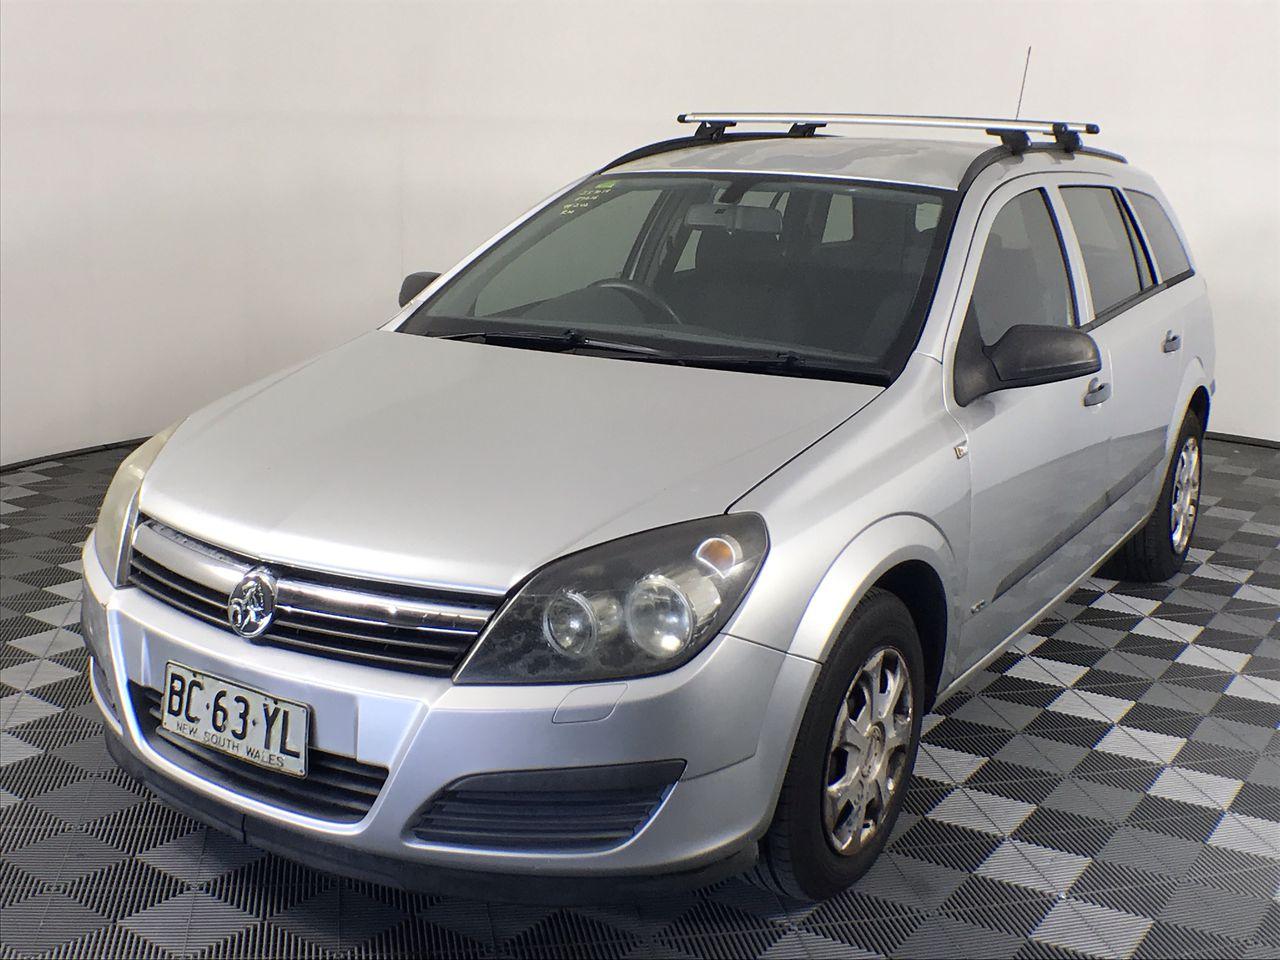 2006 Holden Astra CD AH Manual Wagon